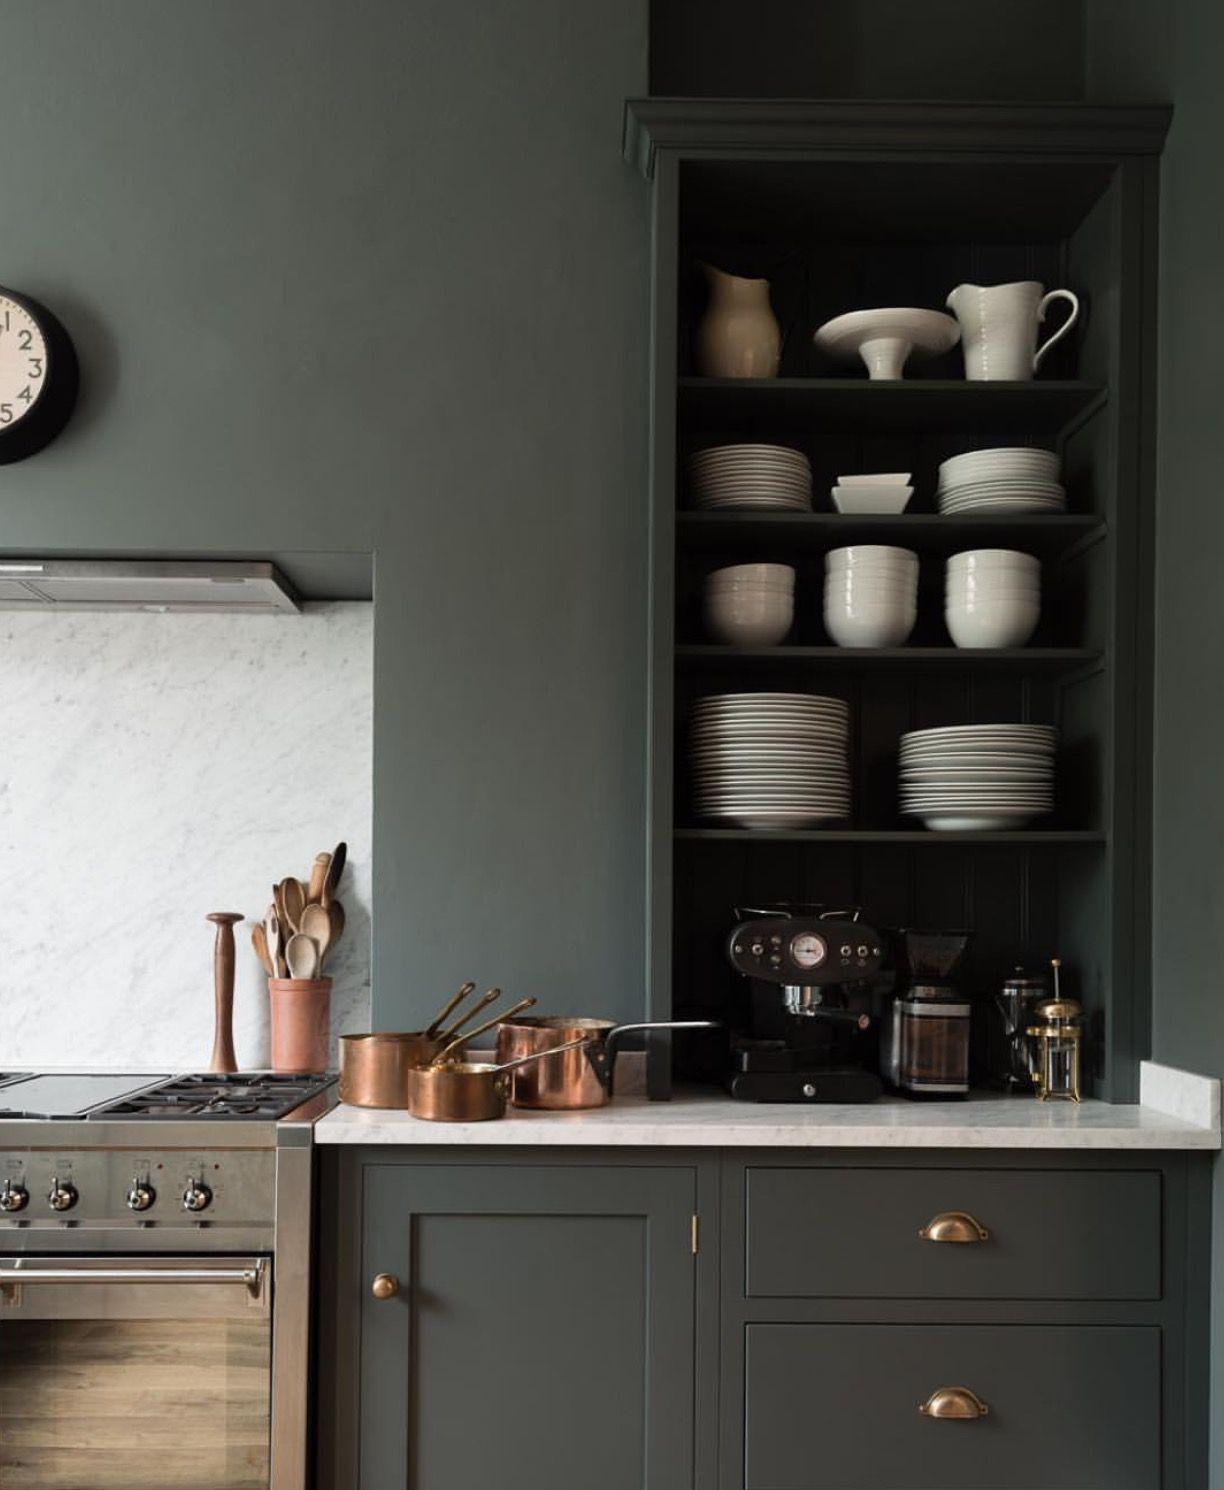 Love the hardware | Kitchen ideas | Pinterest | Interior de cocina ...